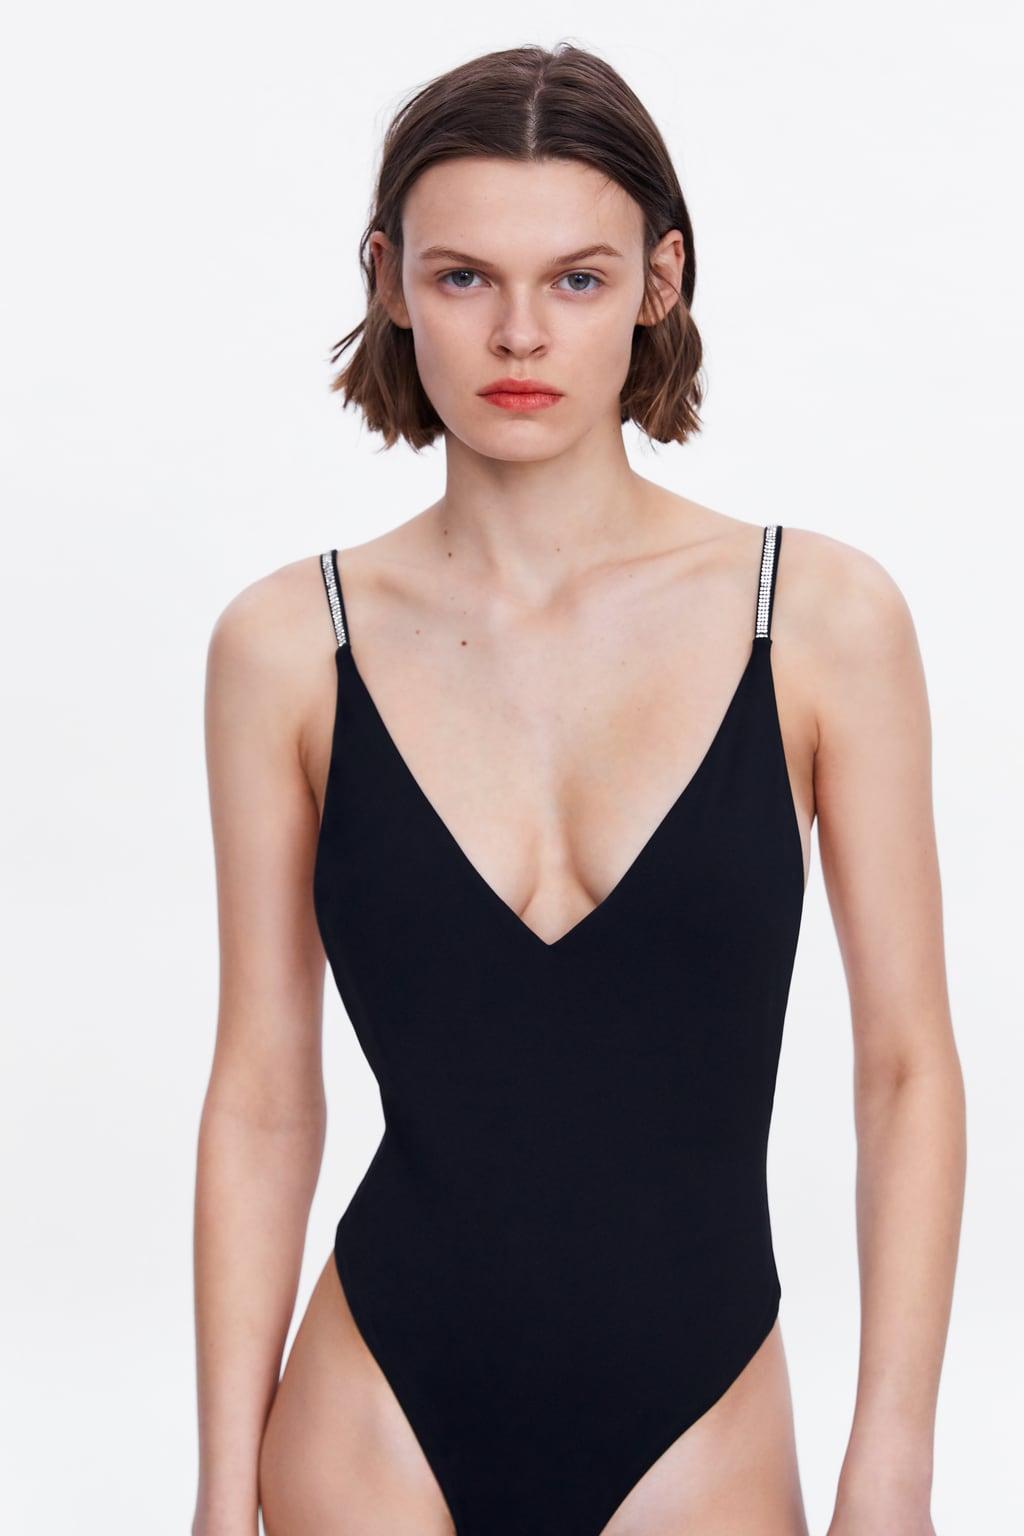 ZARA Costumi da bagno 2019  Lei Trendy